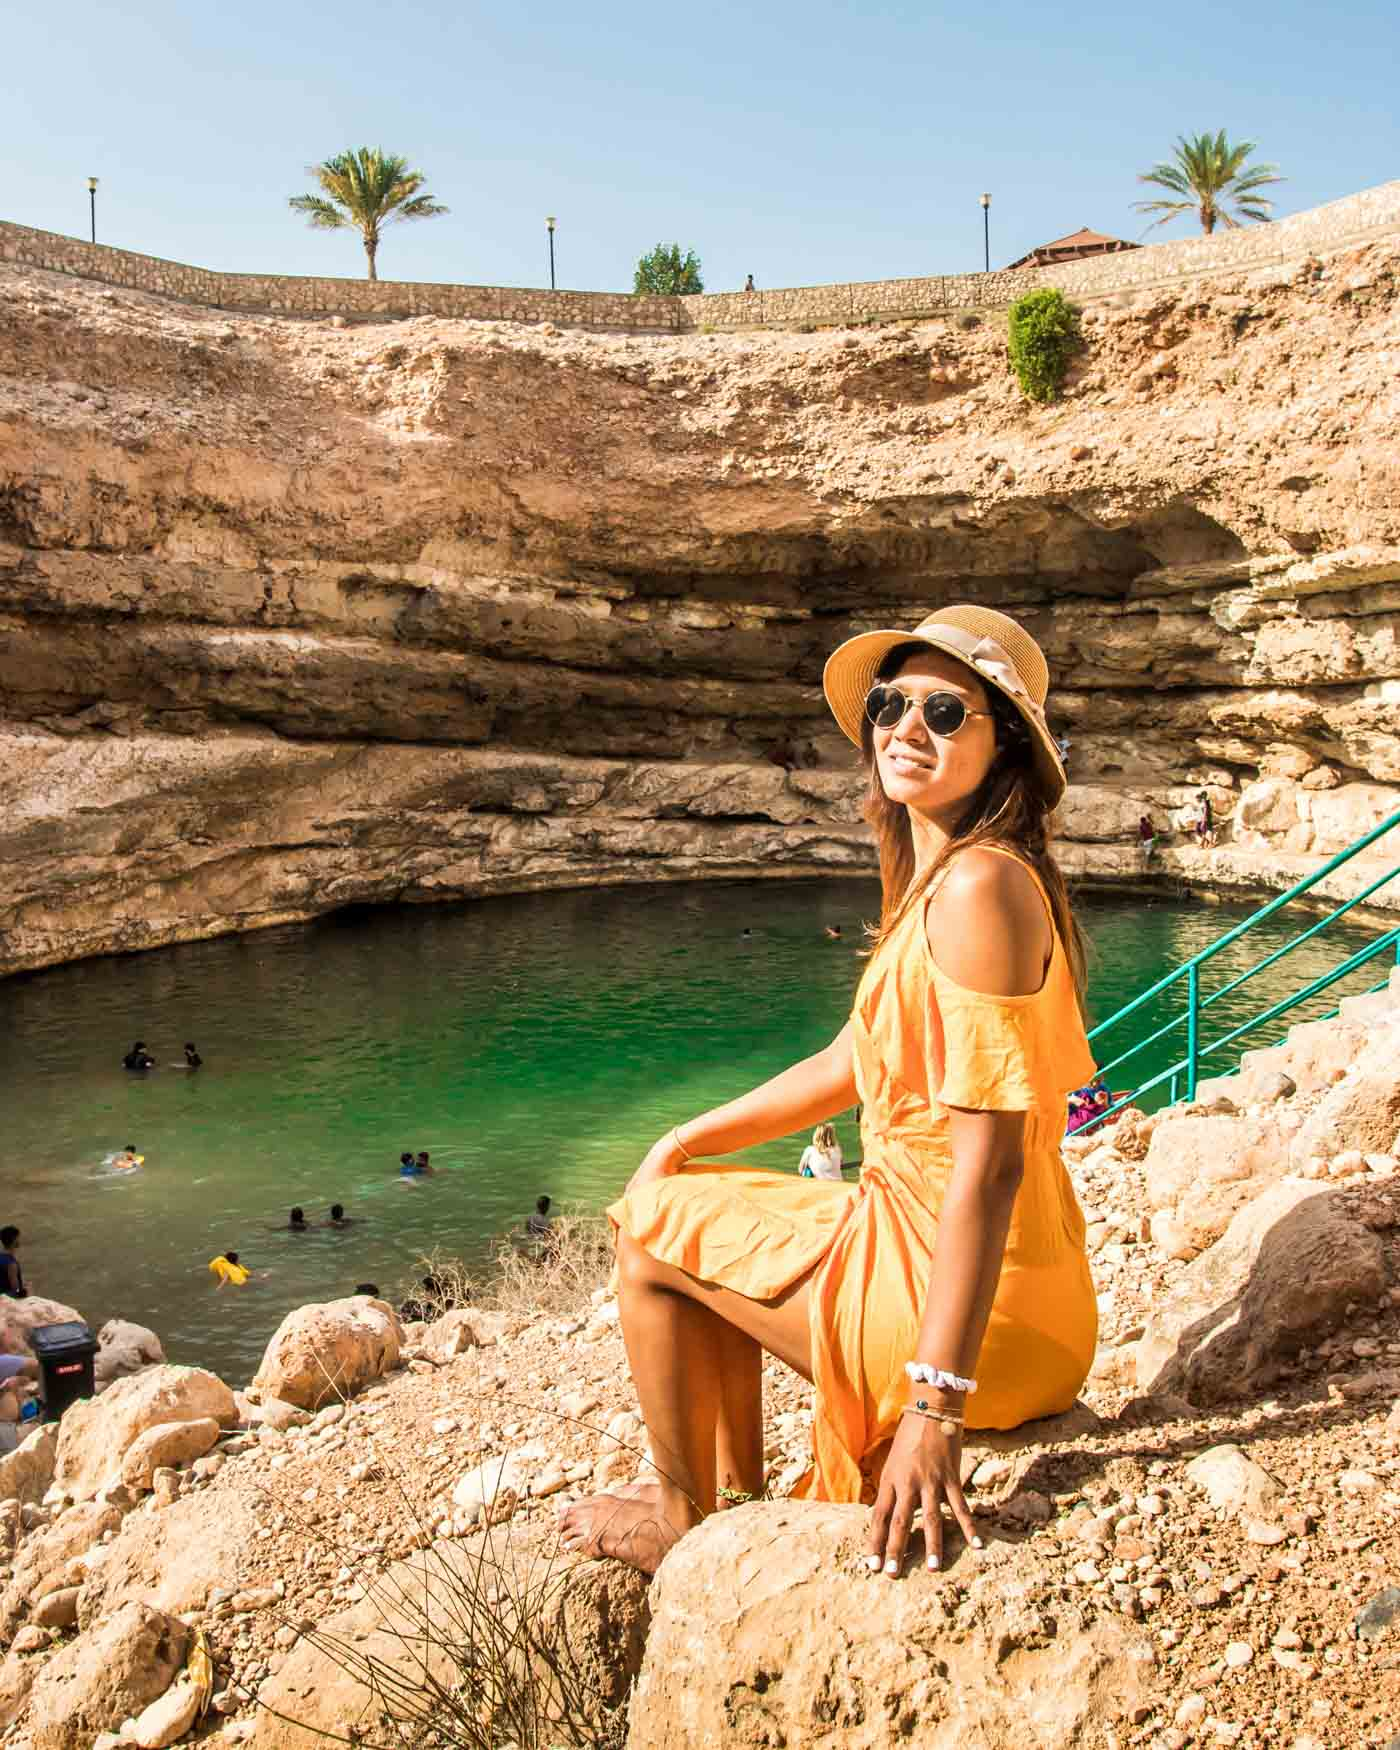 Oman_Muscat_Bimmah_Sinkhole_Road_Trip_Sinkhole_Natural_Pools_Wadis_Shab_Solo_Travel_